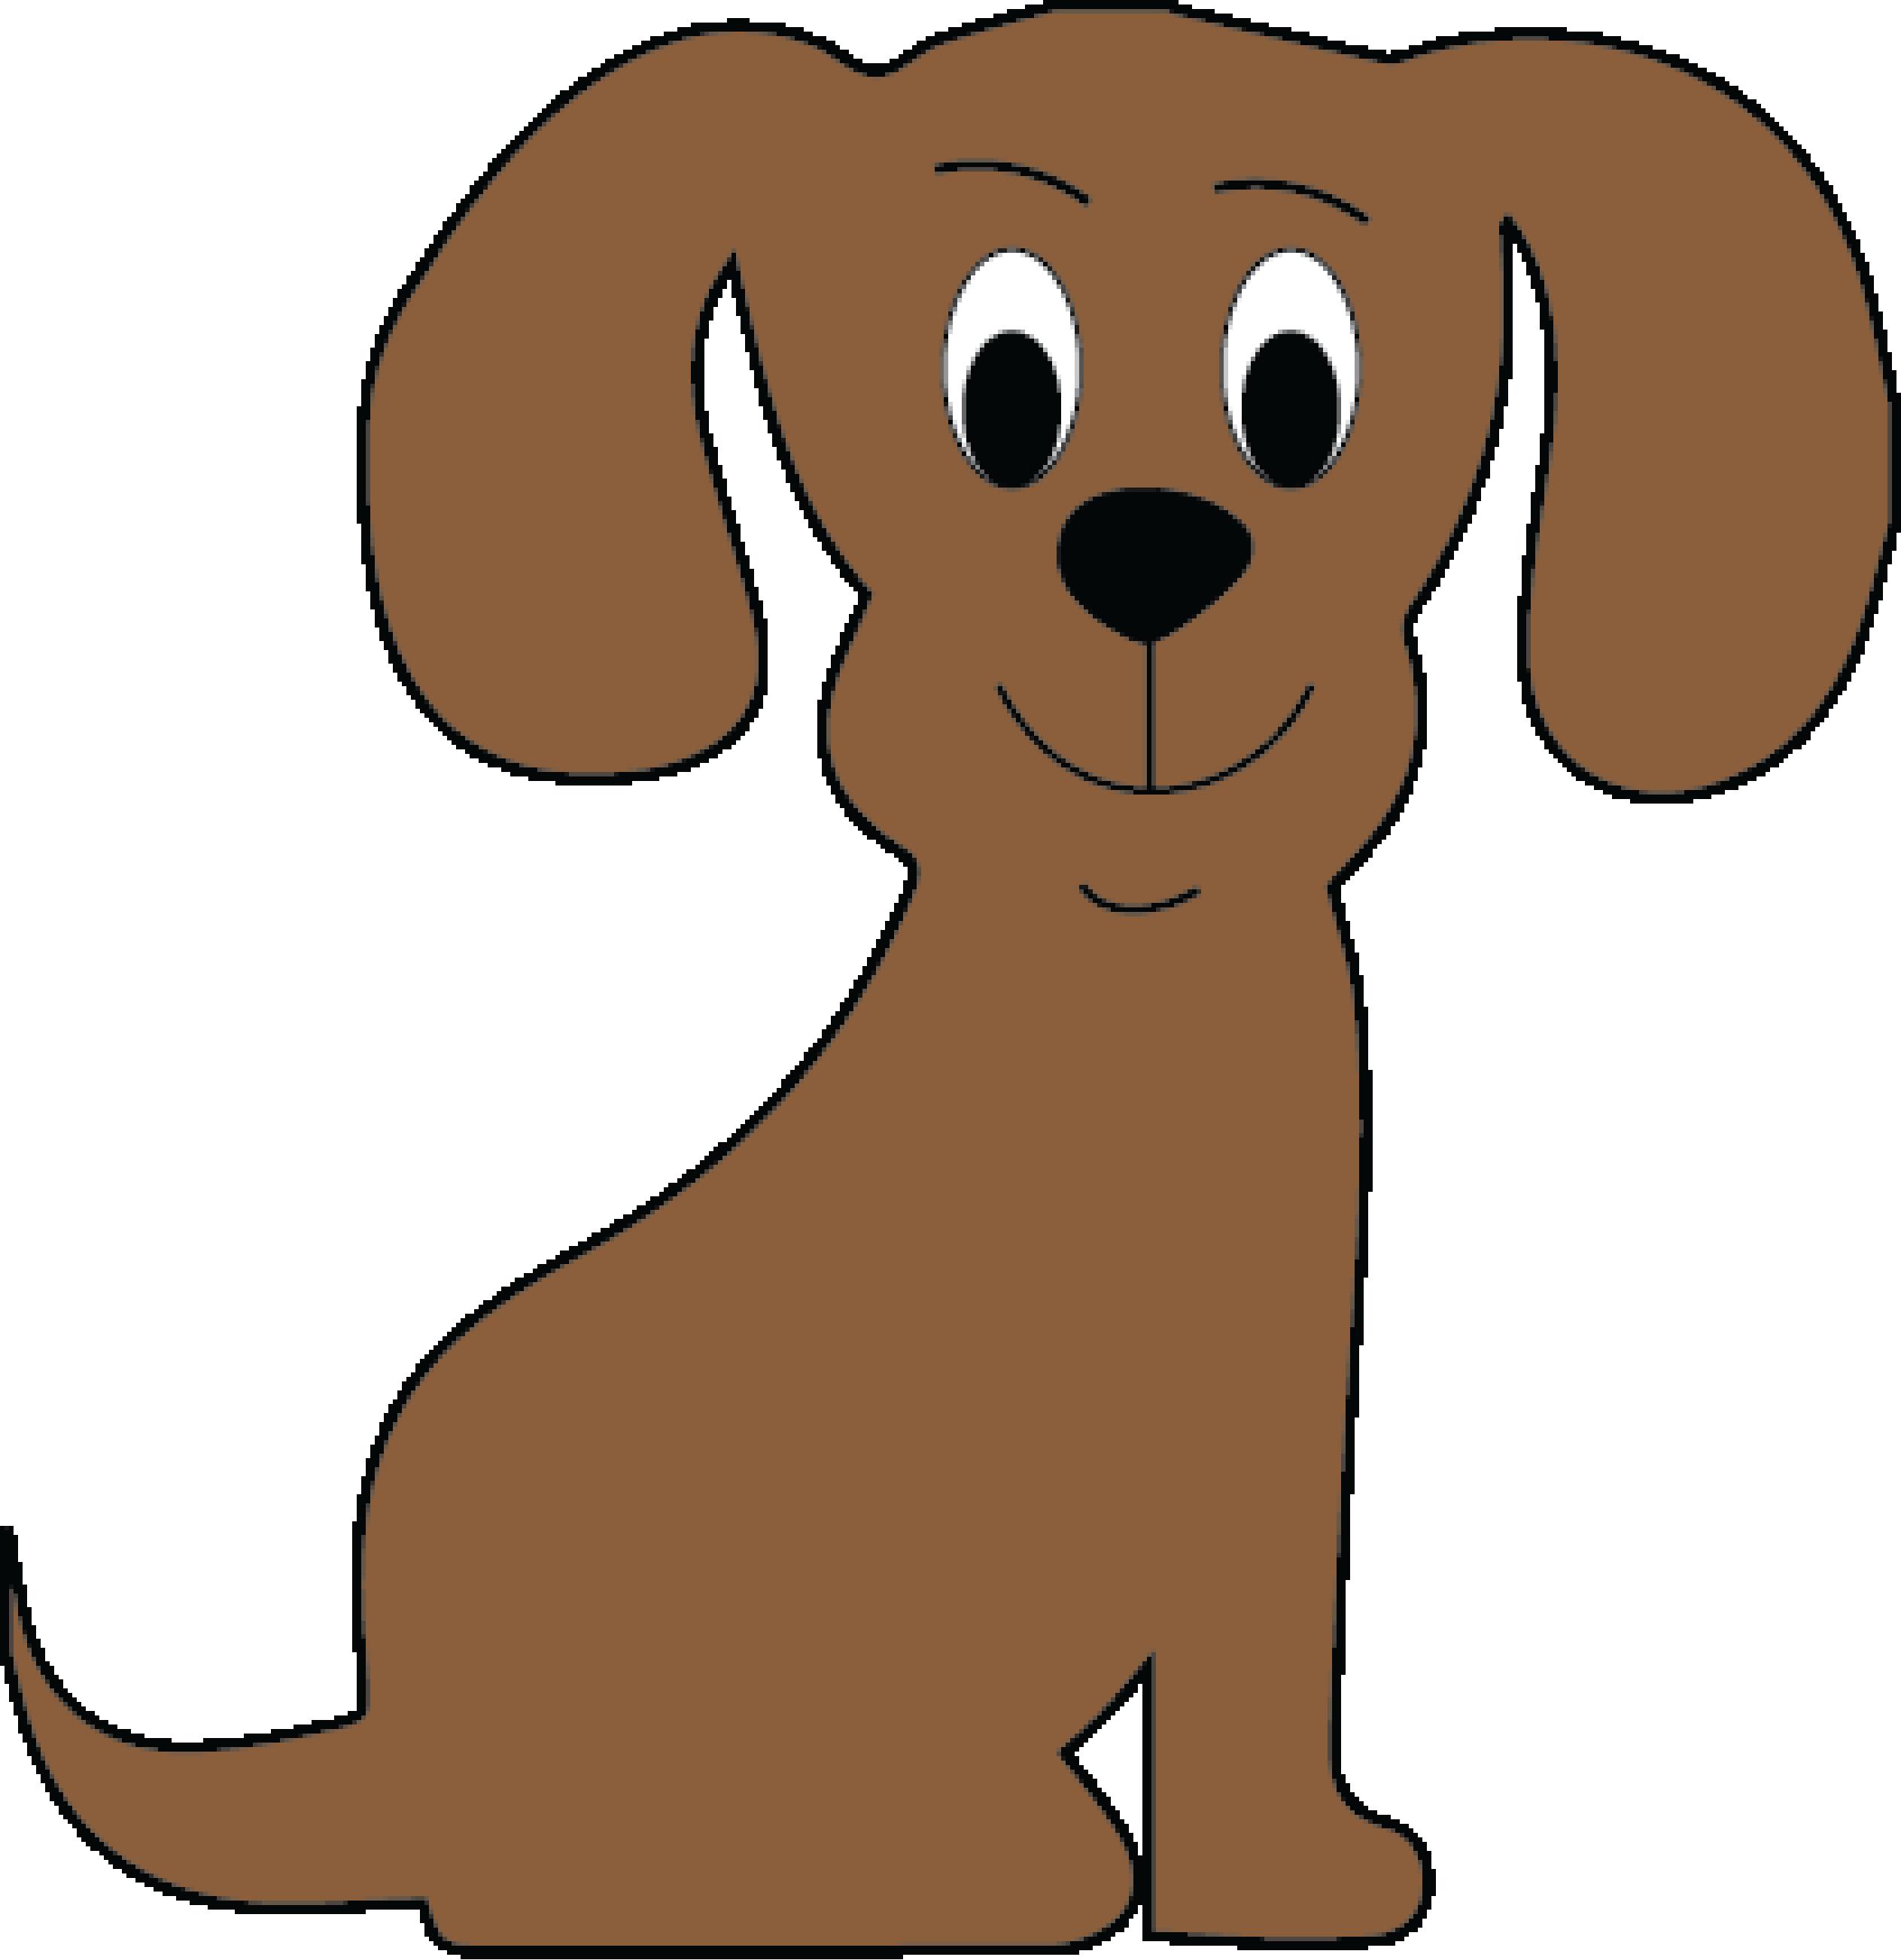 Light brown dog clipart svg free download Animated Dog PNG Transparent Animated Dog.PNG Images. | PlusPNG svg free download